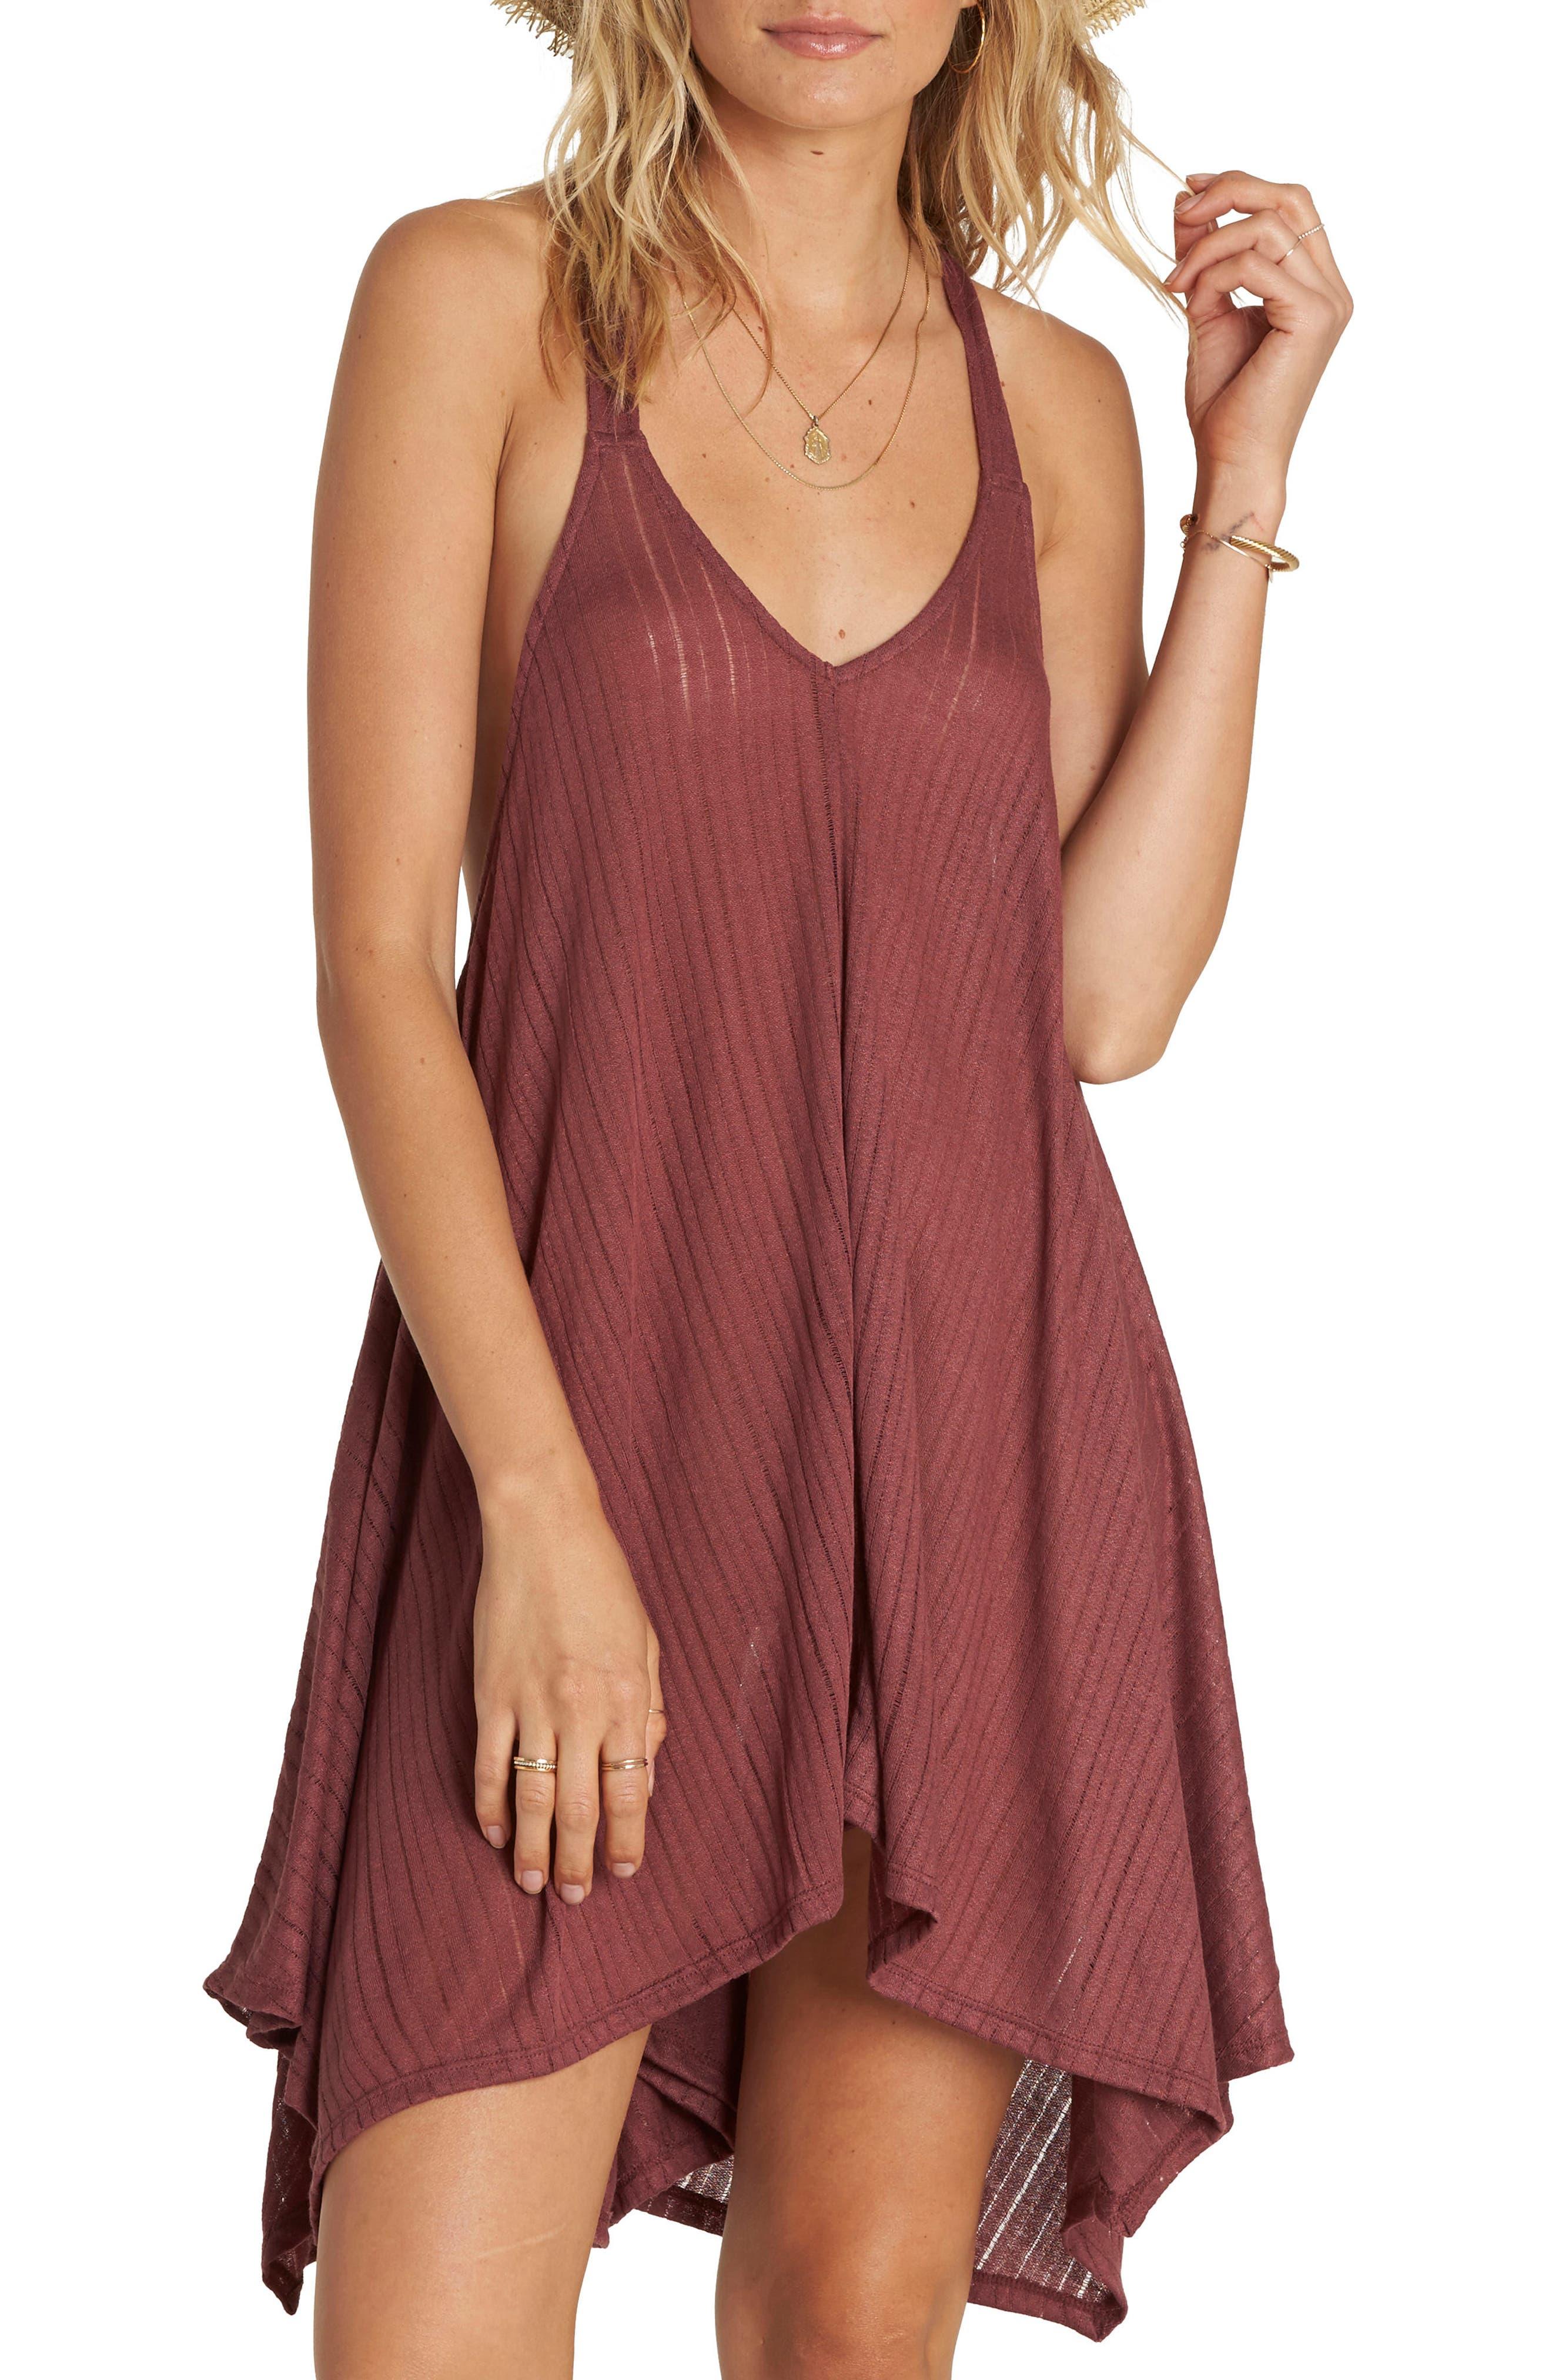 Main Image - Billabong Twisted View Cover-Up Dress